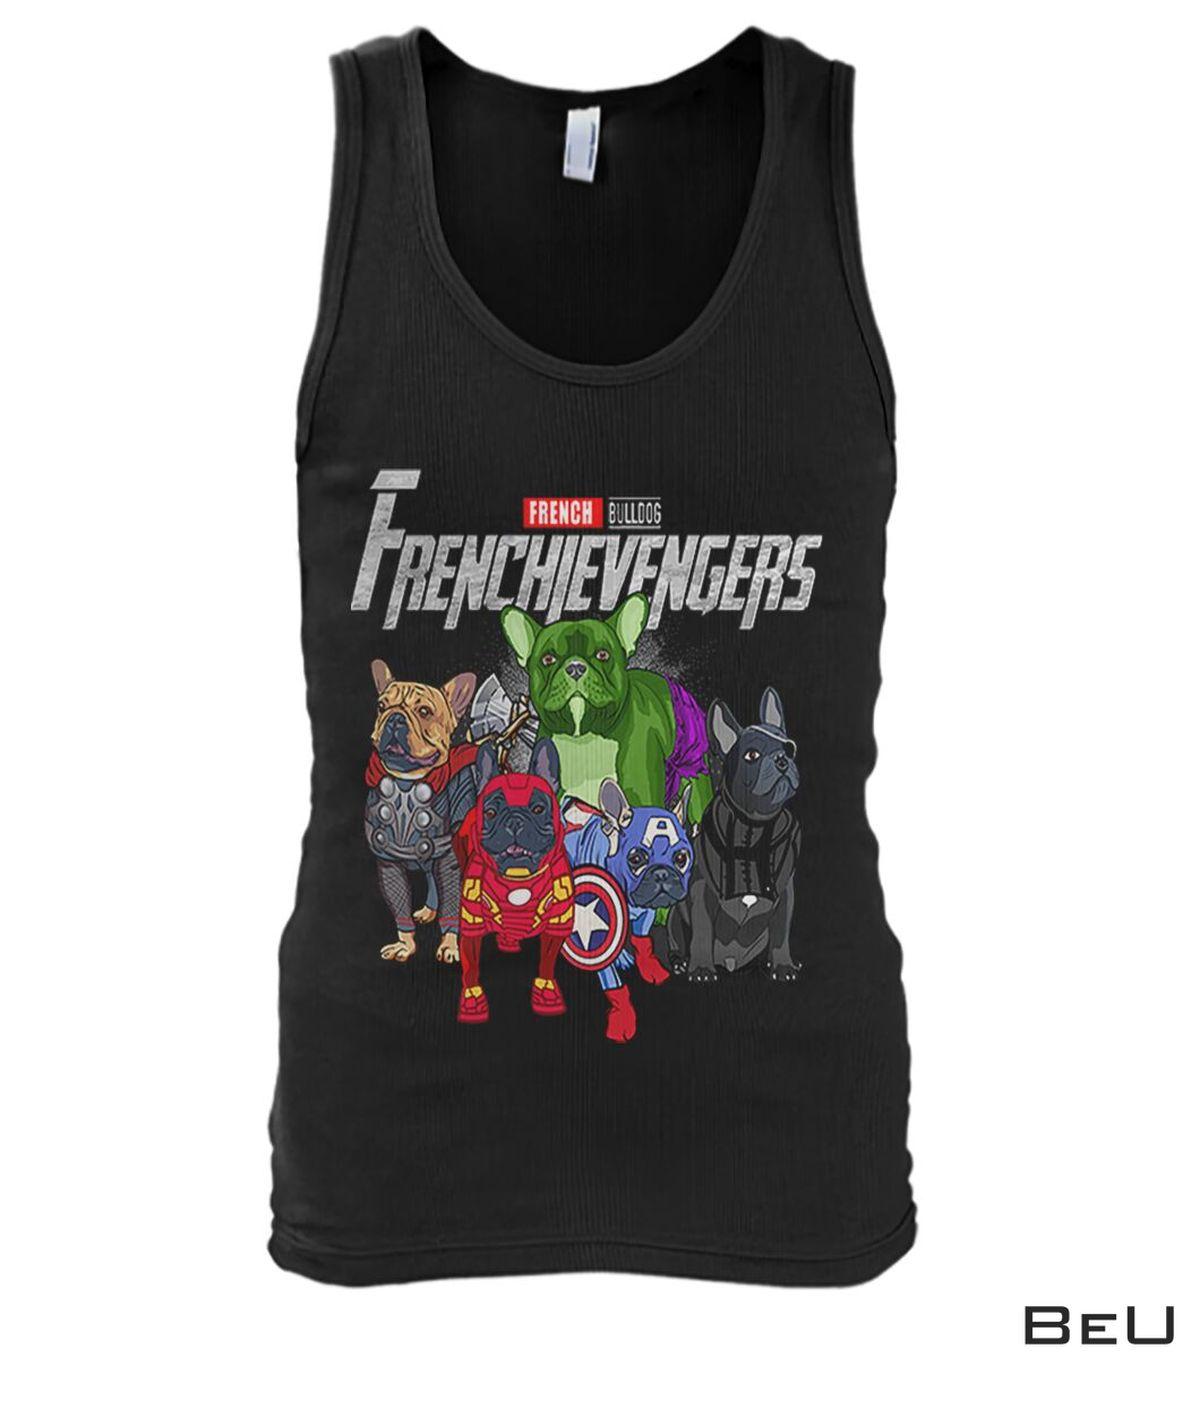 French Bulldog Frenchievengers Avengers Shirtx